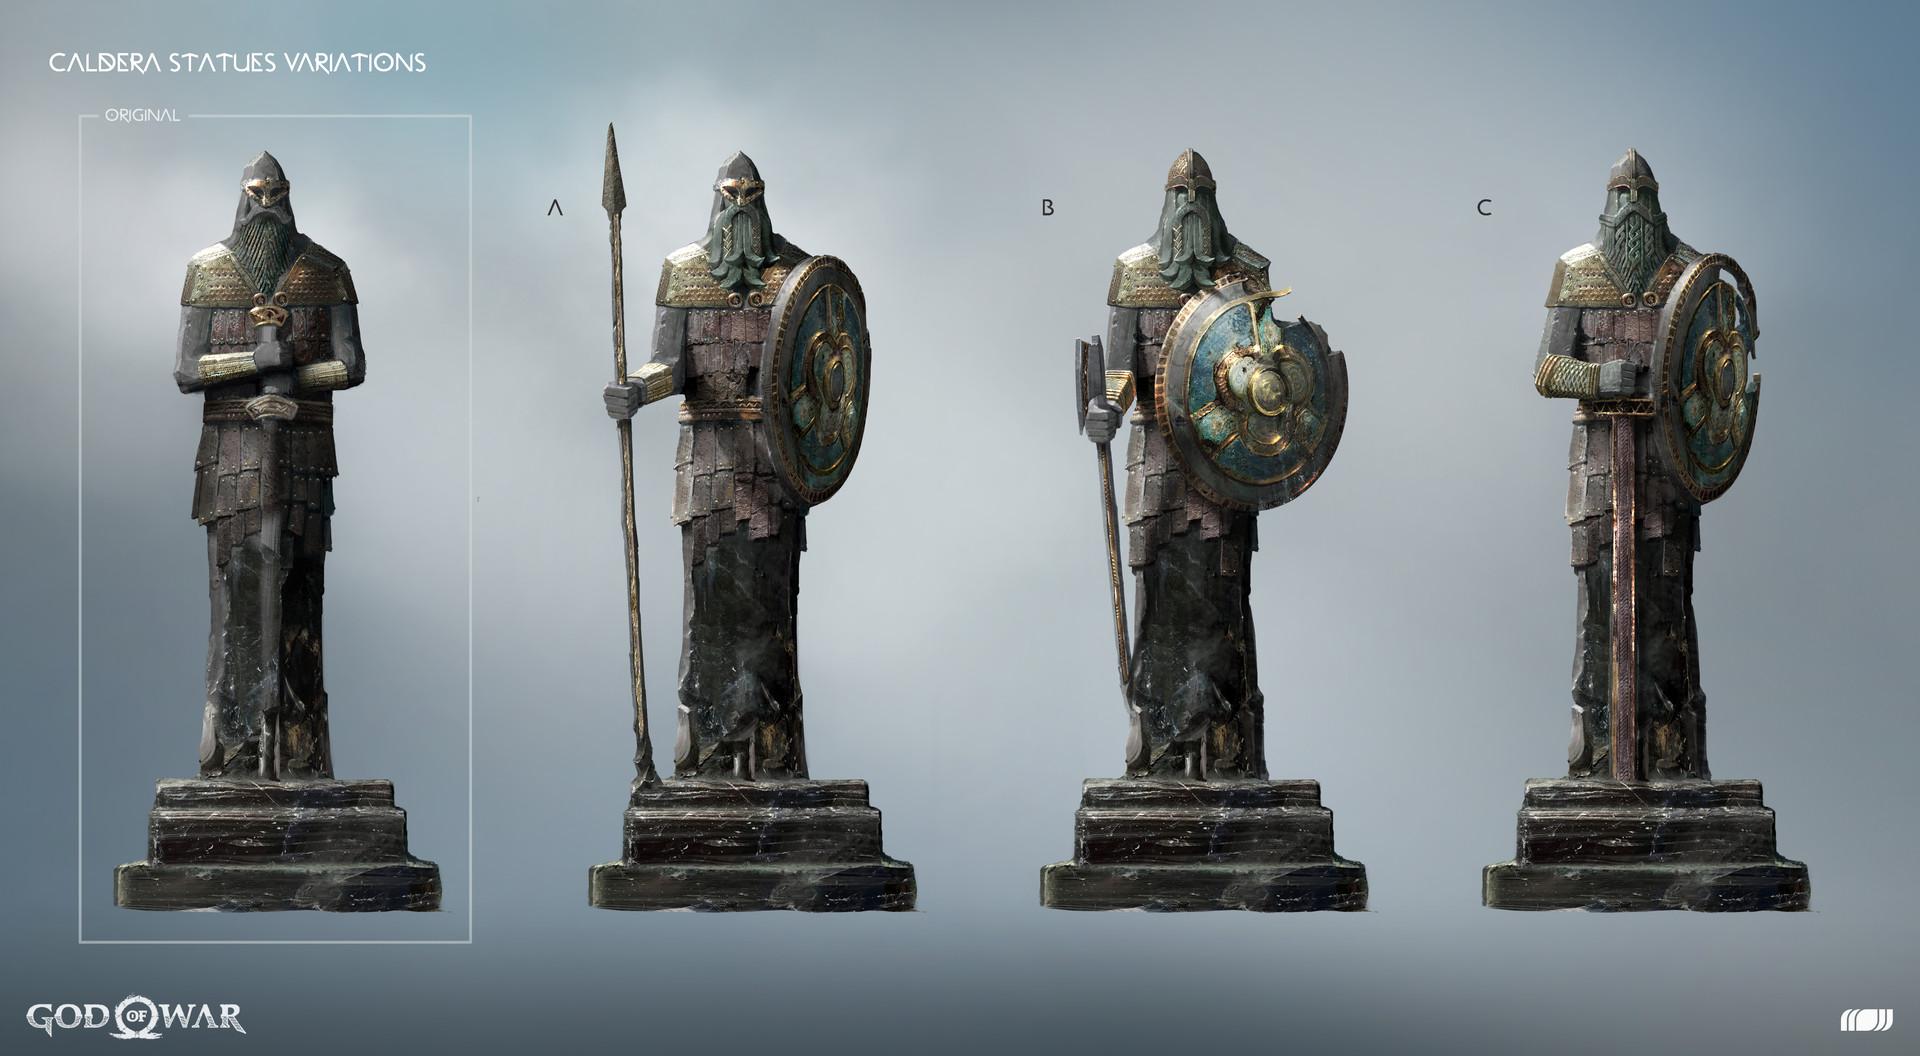 jin-kim-caldera-statues-jk-003-variations.jpg